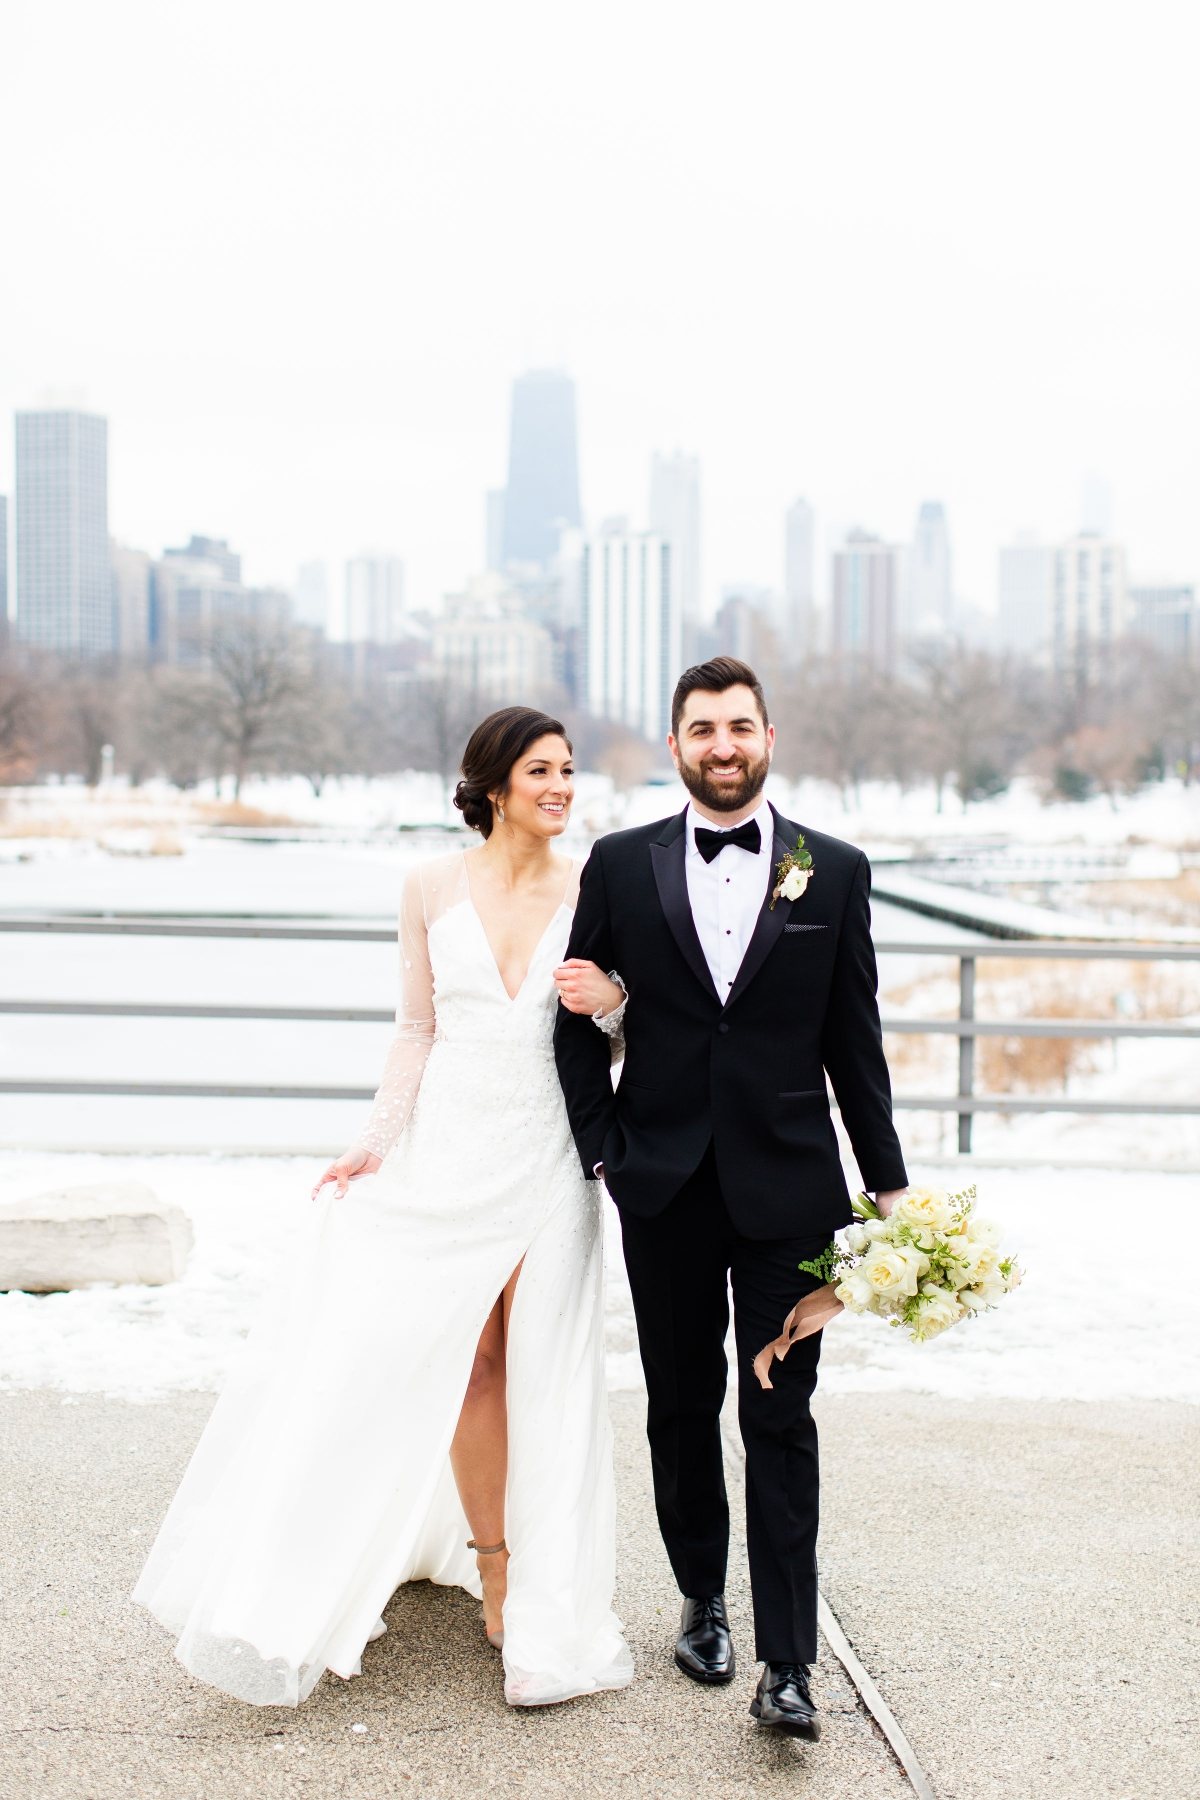 Chicago Winter Wedding Inspiration